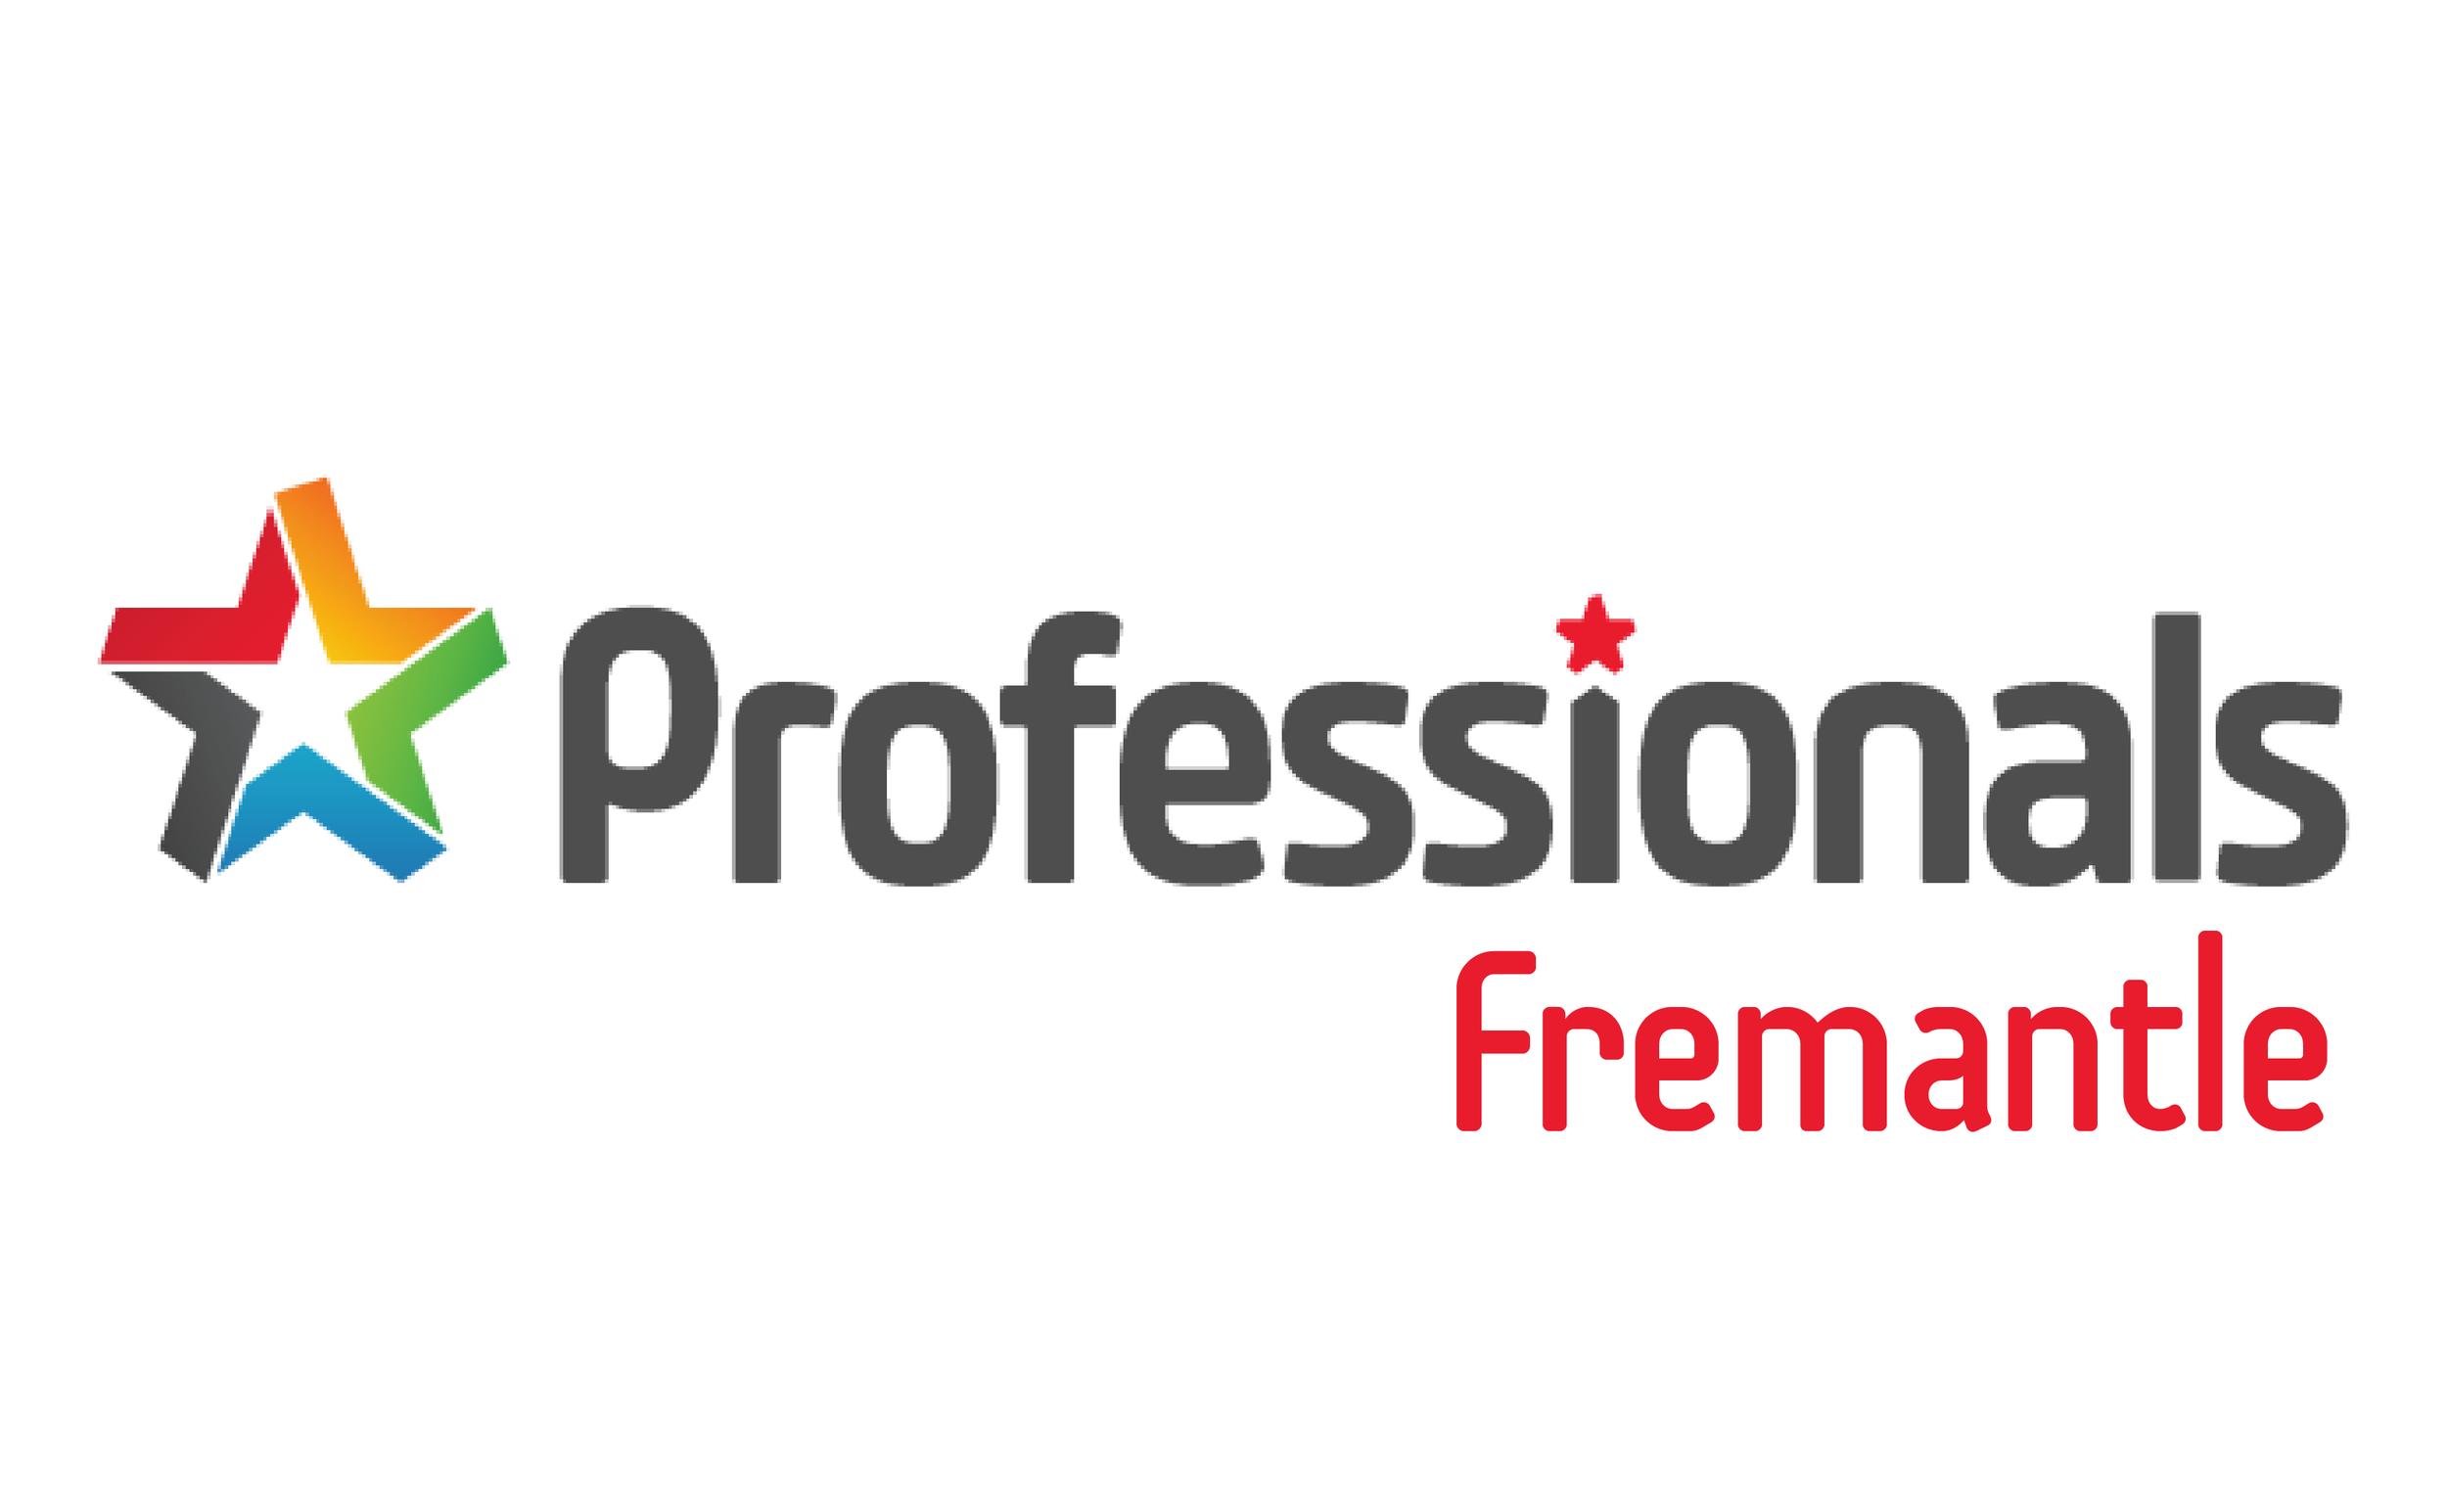 Professionals Fremantle